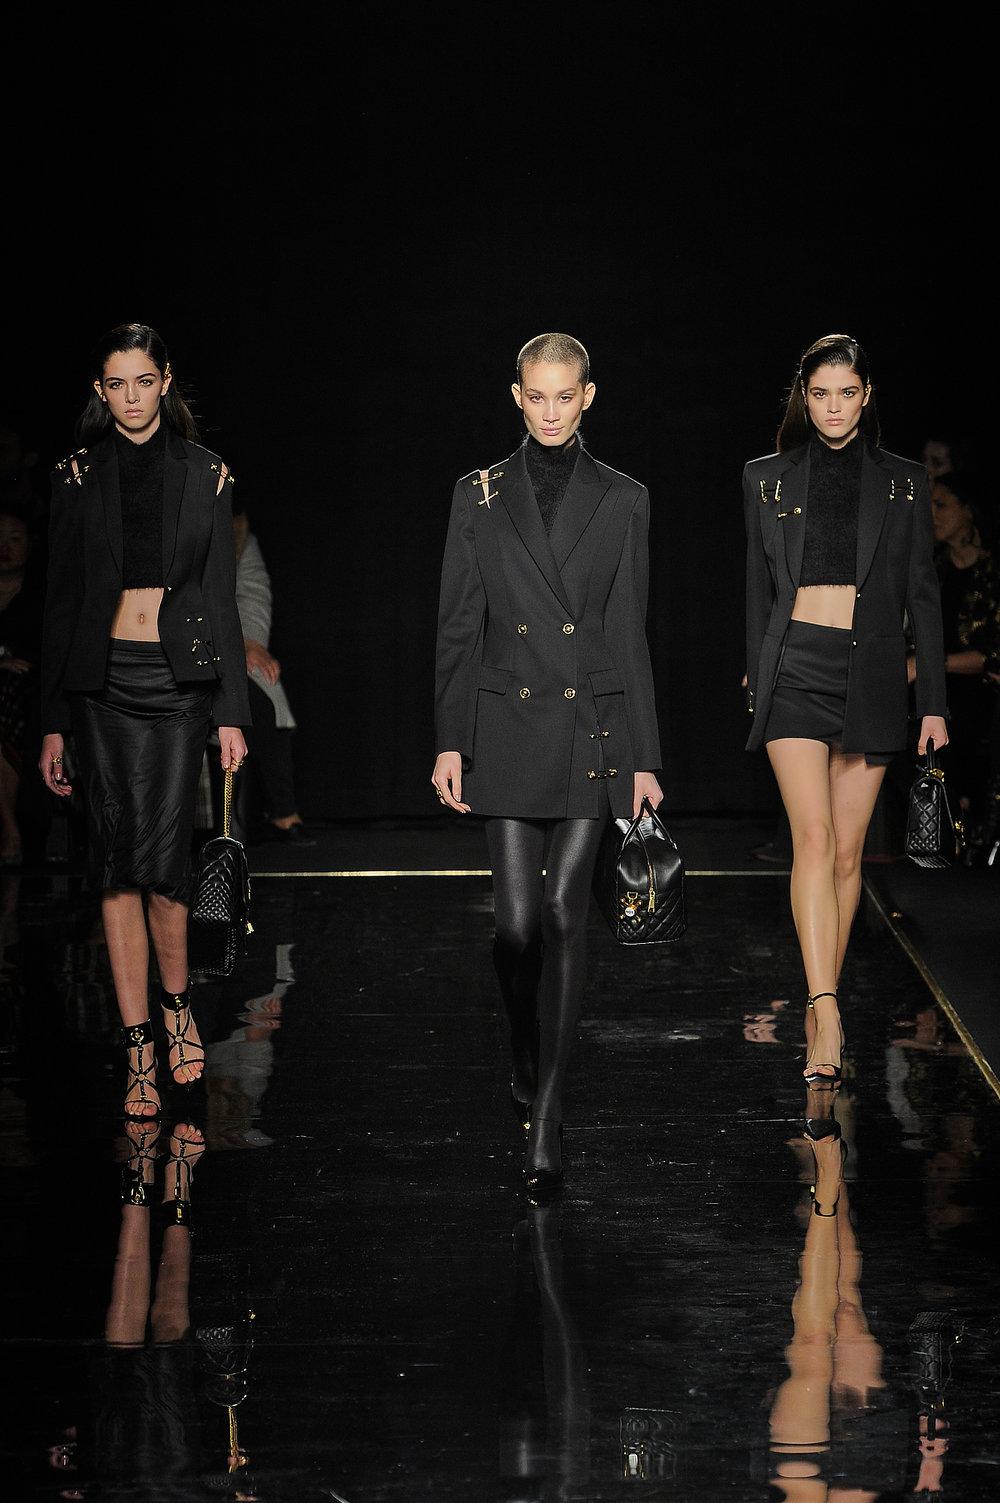 Versace_24_e6_versace_runway_runway_00024.jpg